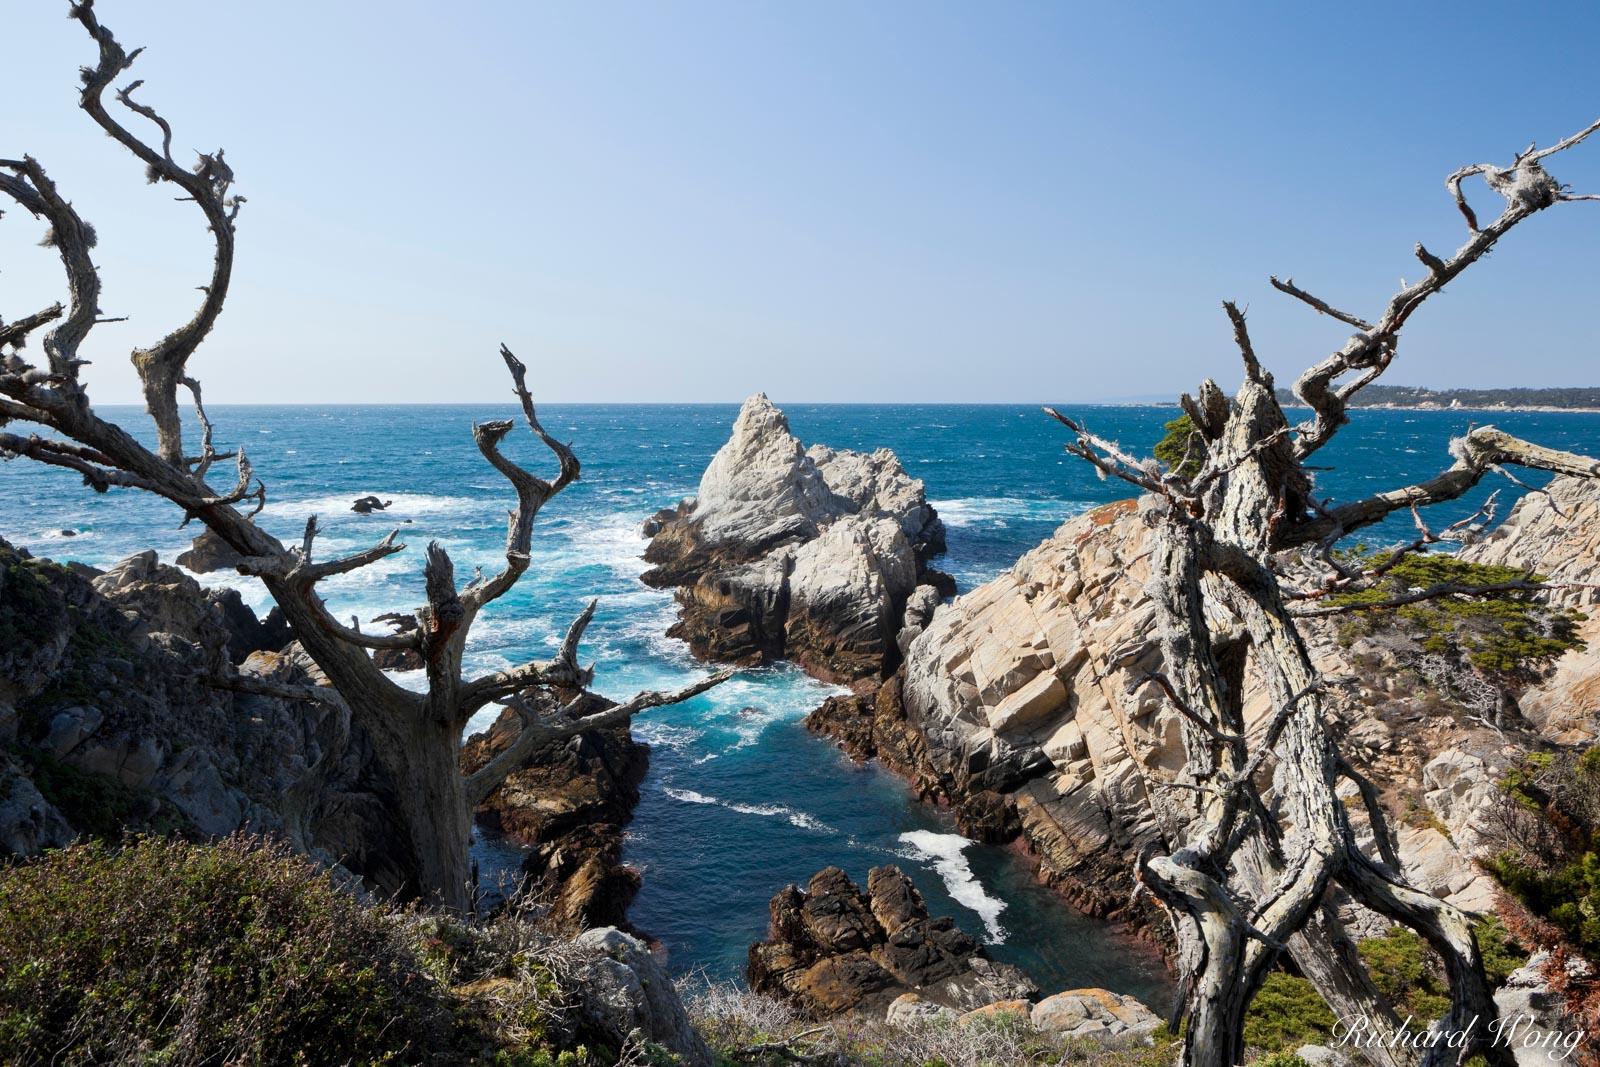 Monterey Cypress Trees Framing Scenic Vista Along Allan Memorial Grove Trail, Point Lobos State Reserve, California, photo